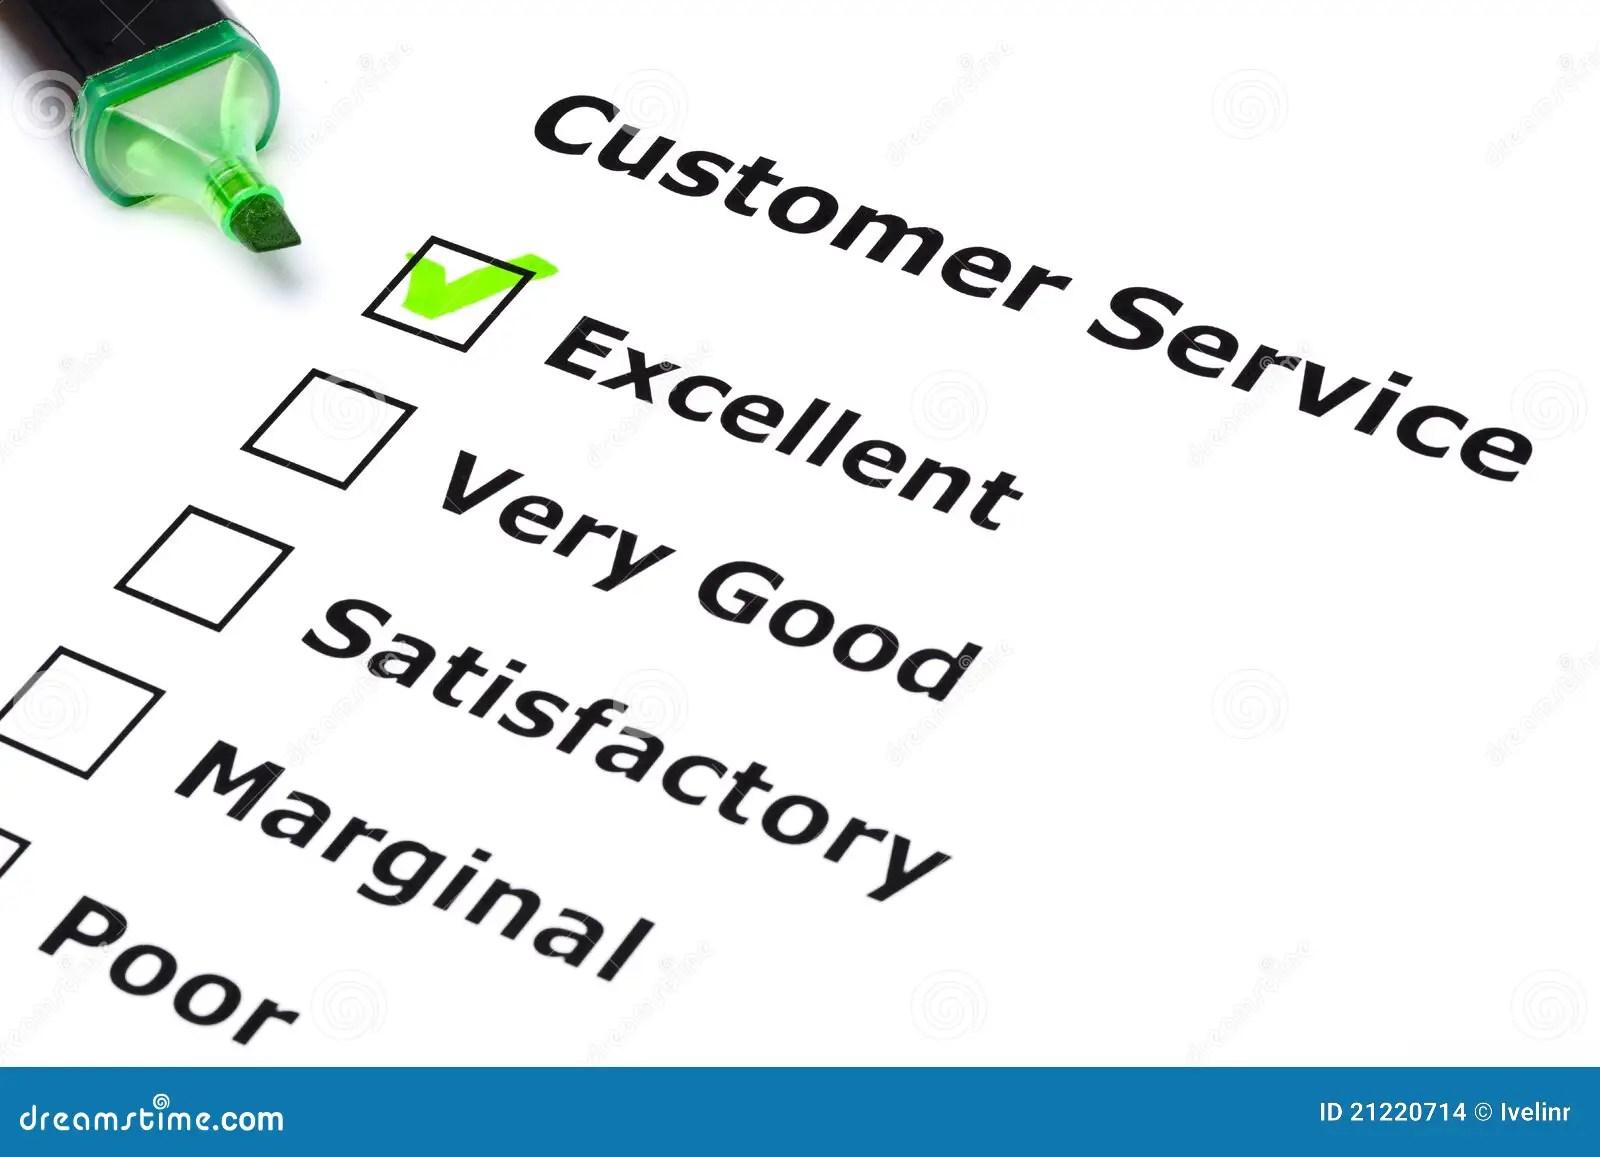 Customer service survey stock photo. Image of organization